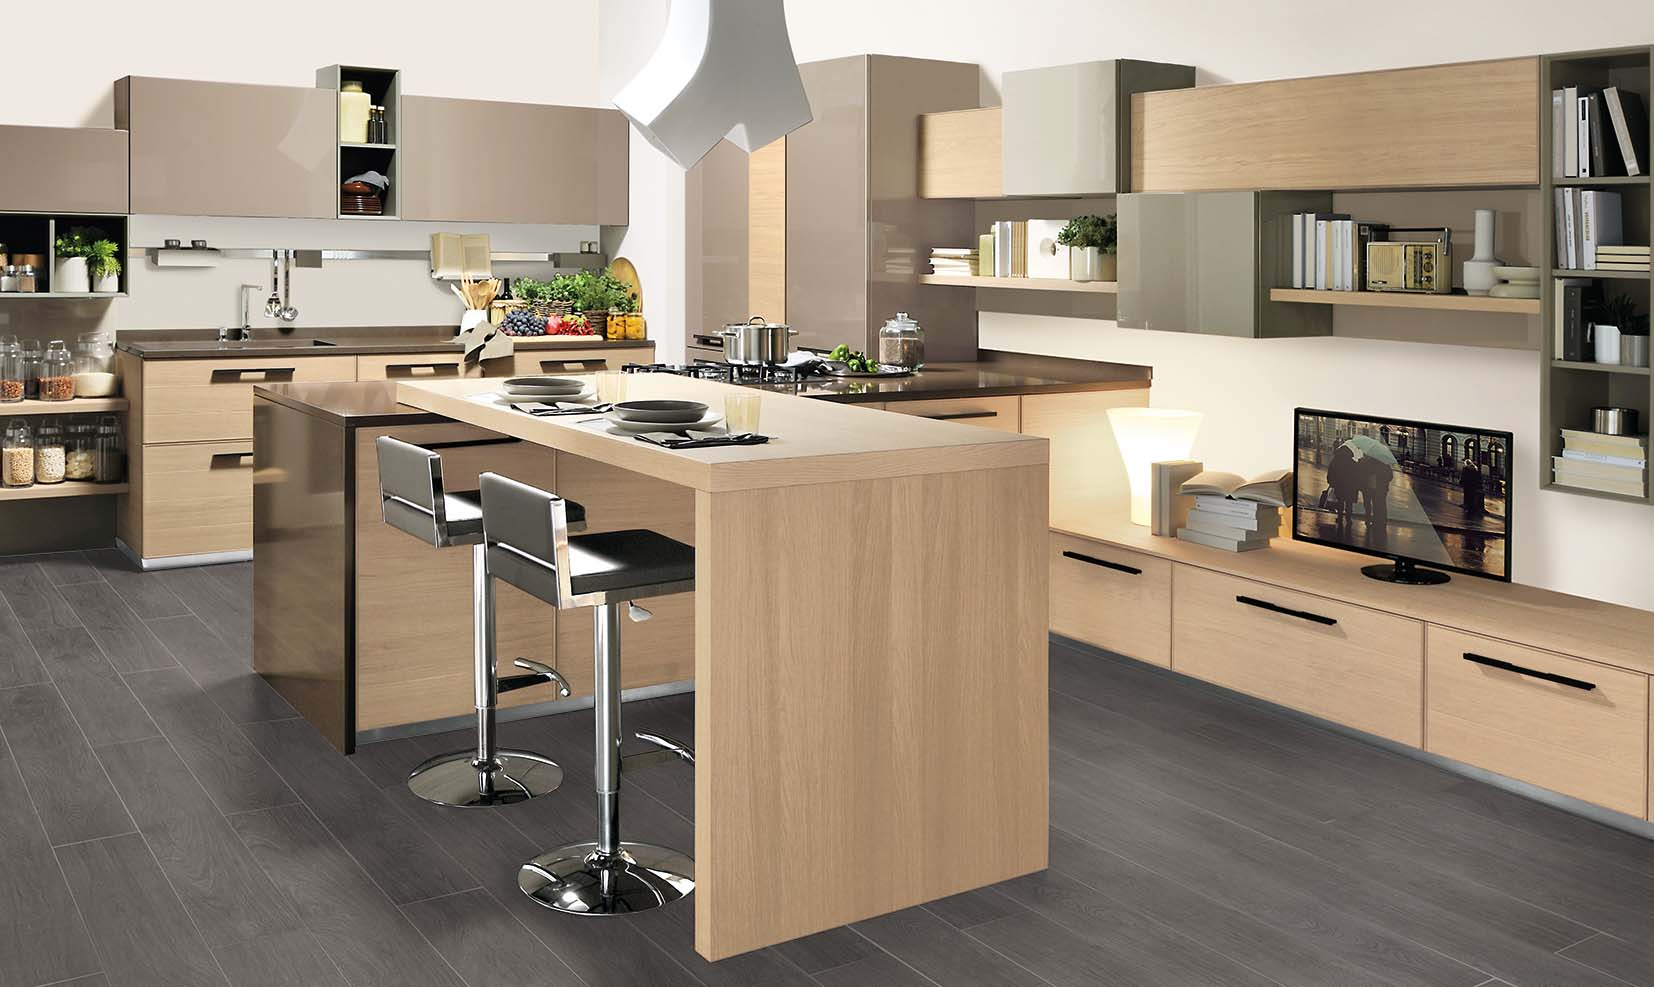 Cucine Moderne Ad Isola.Le Cucine Ad Isola Moderne E Multifunzionali